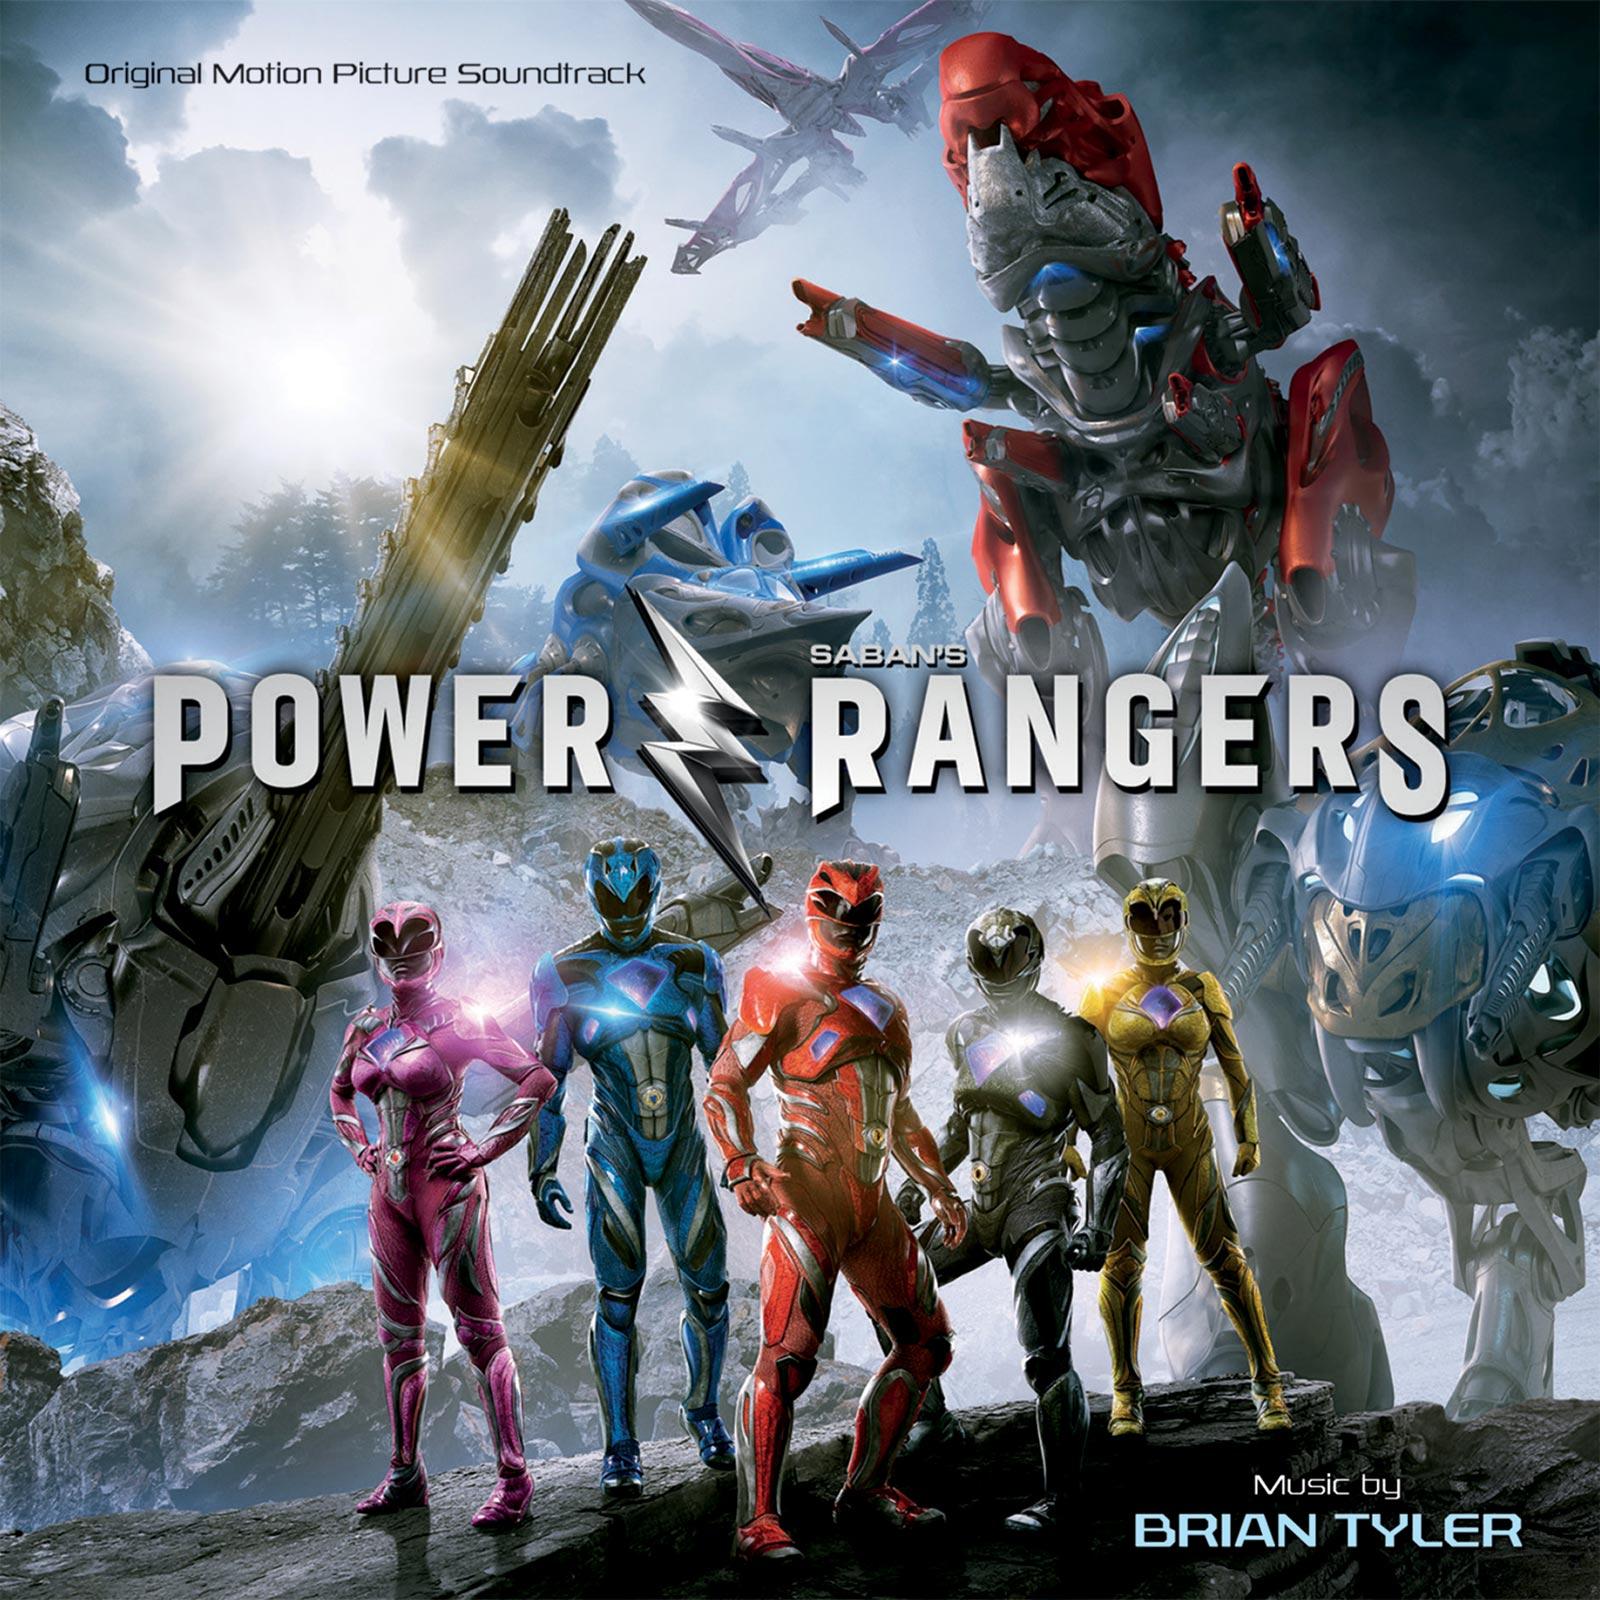 Power_Rangers_Cover